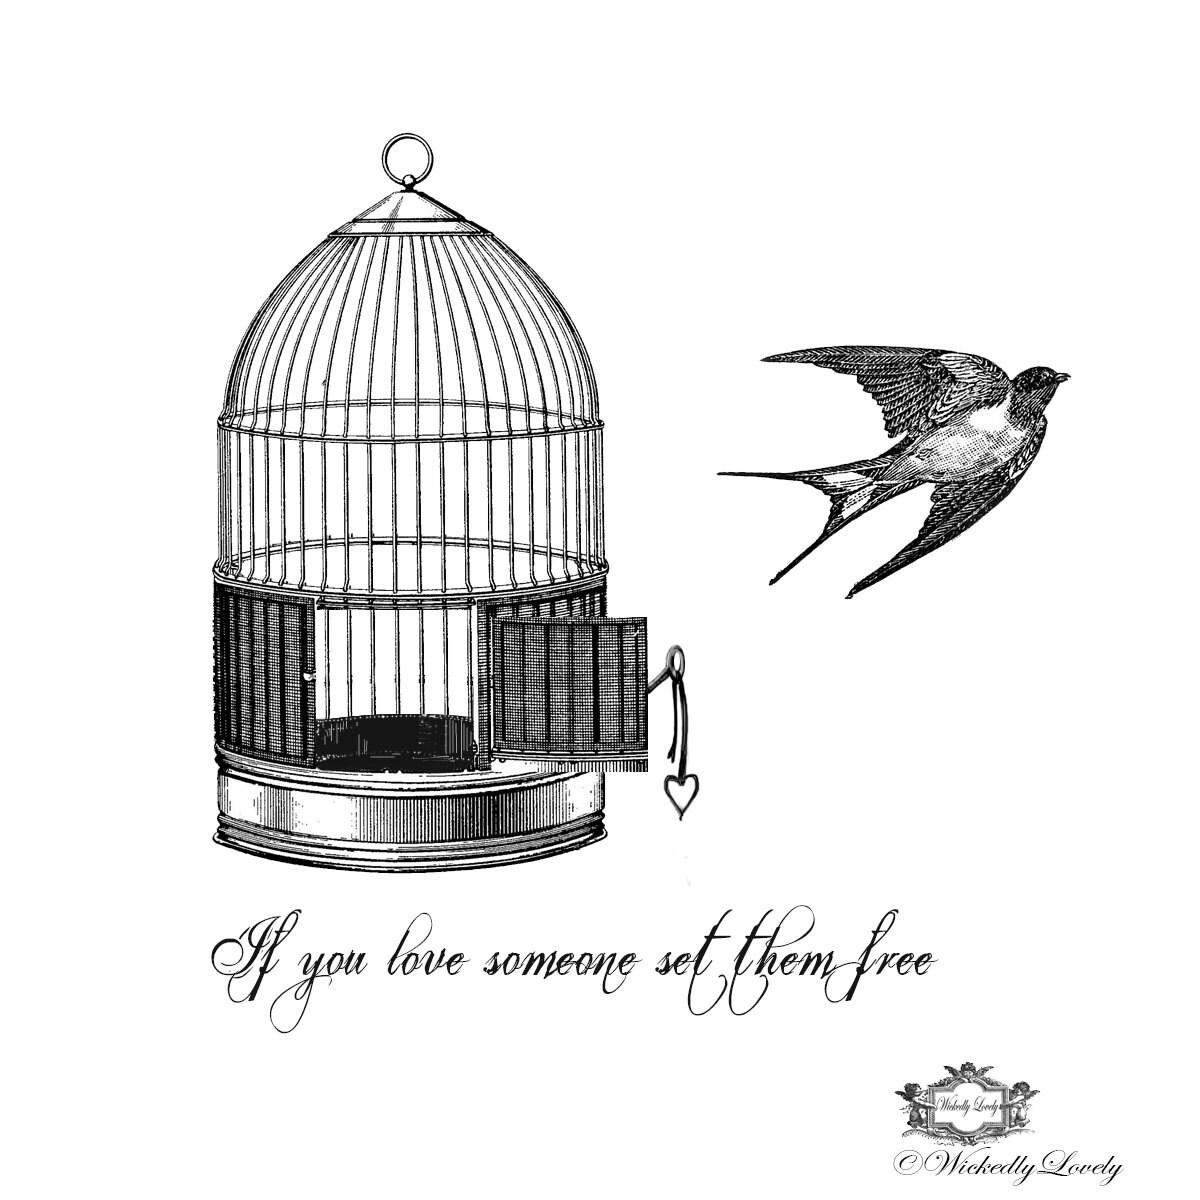 caged bird sings poem